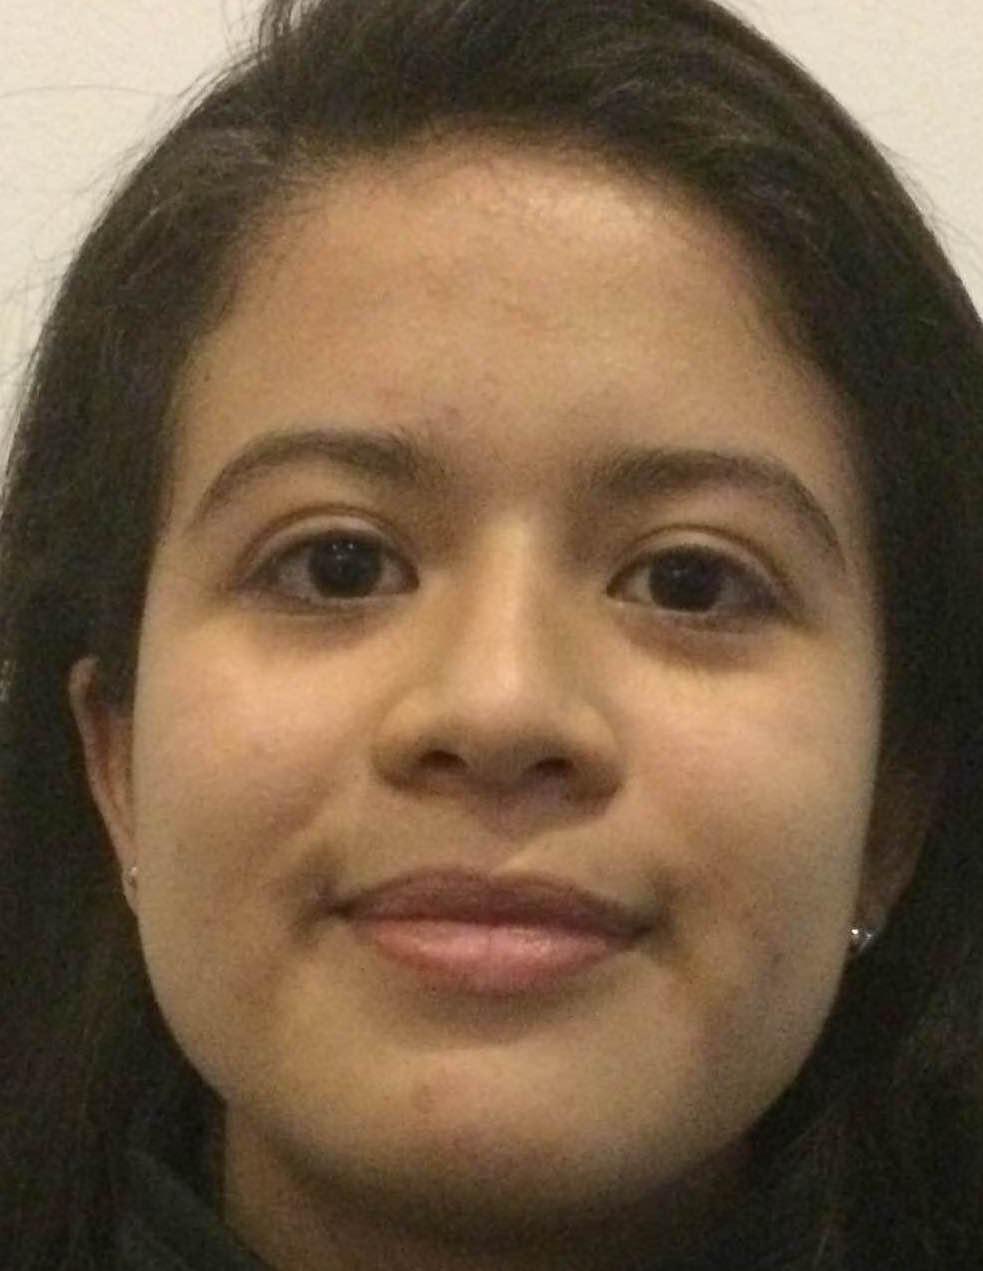 Ana Carolina <b>Olivera Lopez</b> - 1411639124364_aU